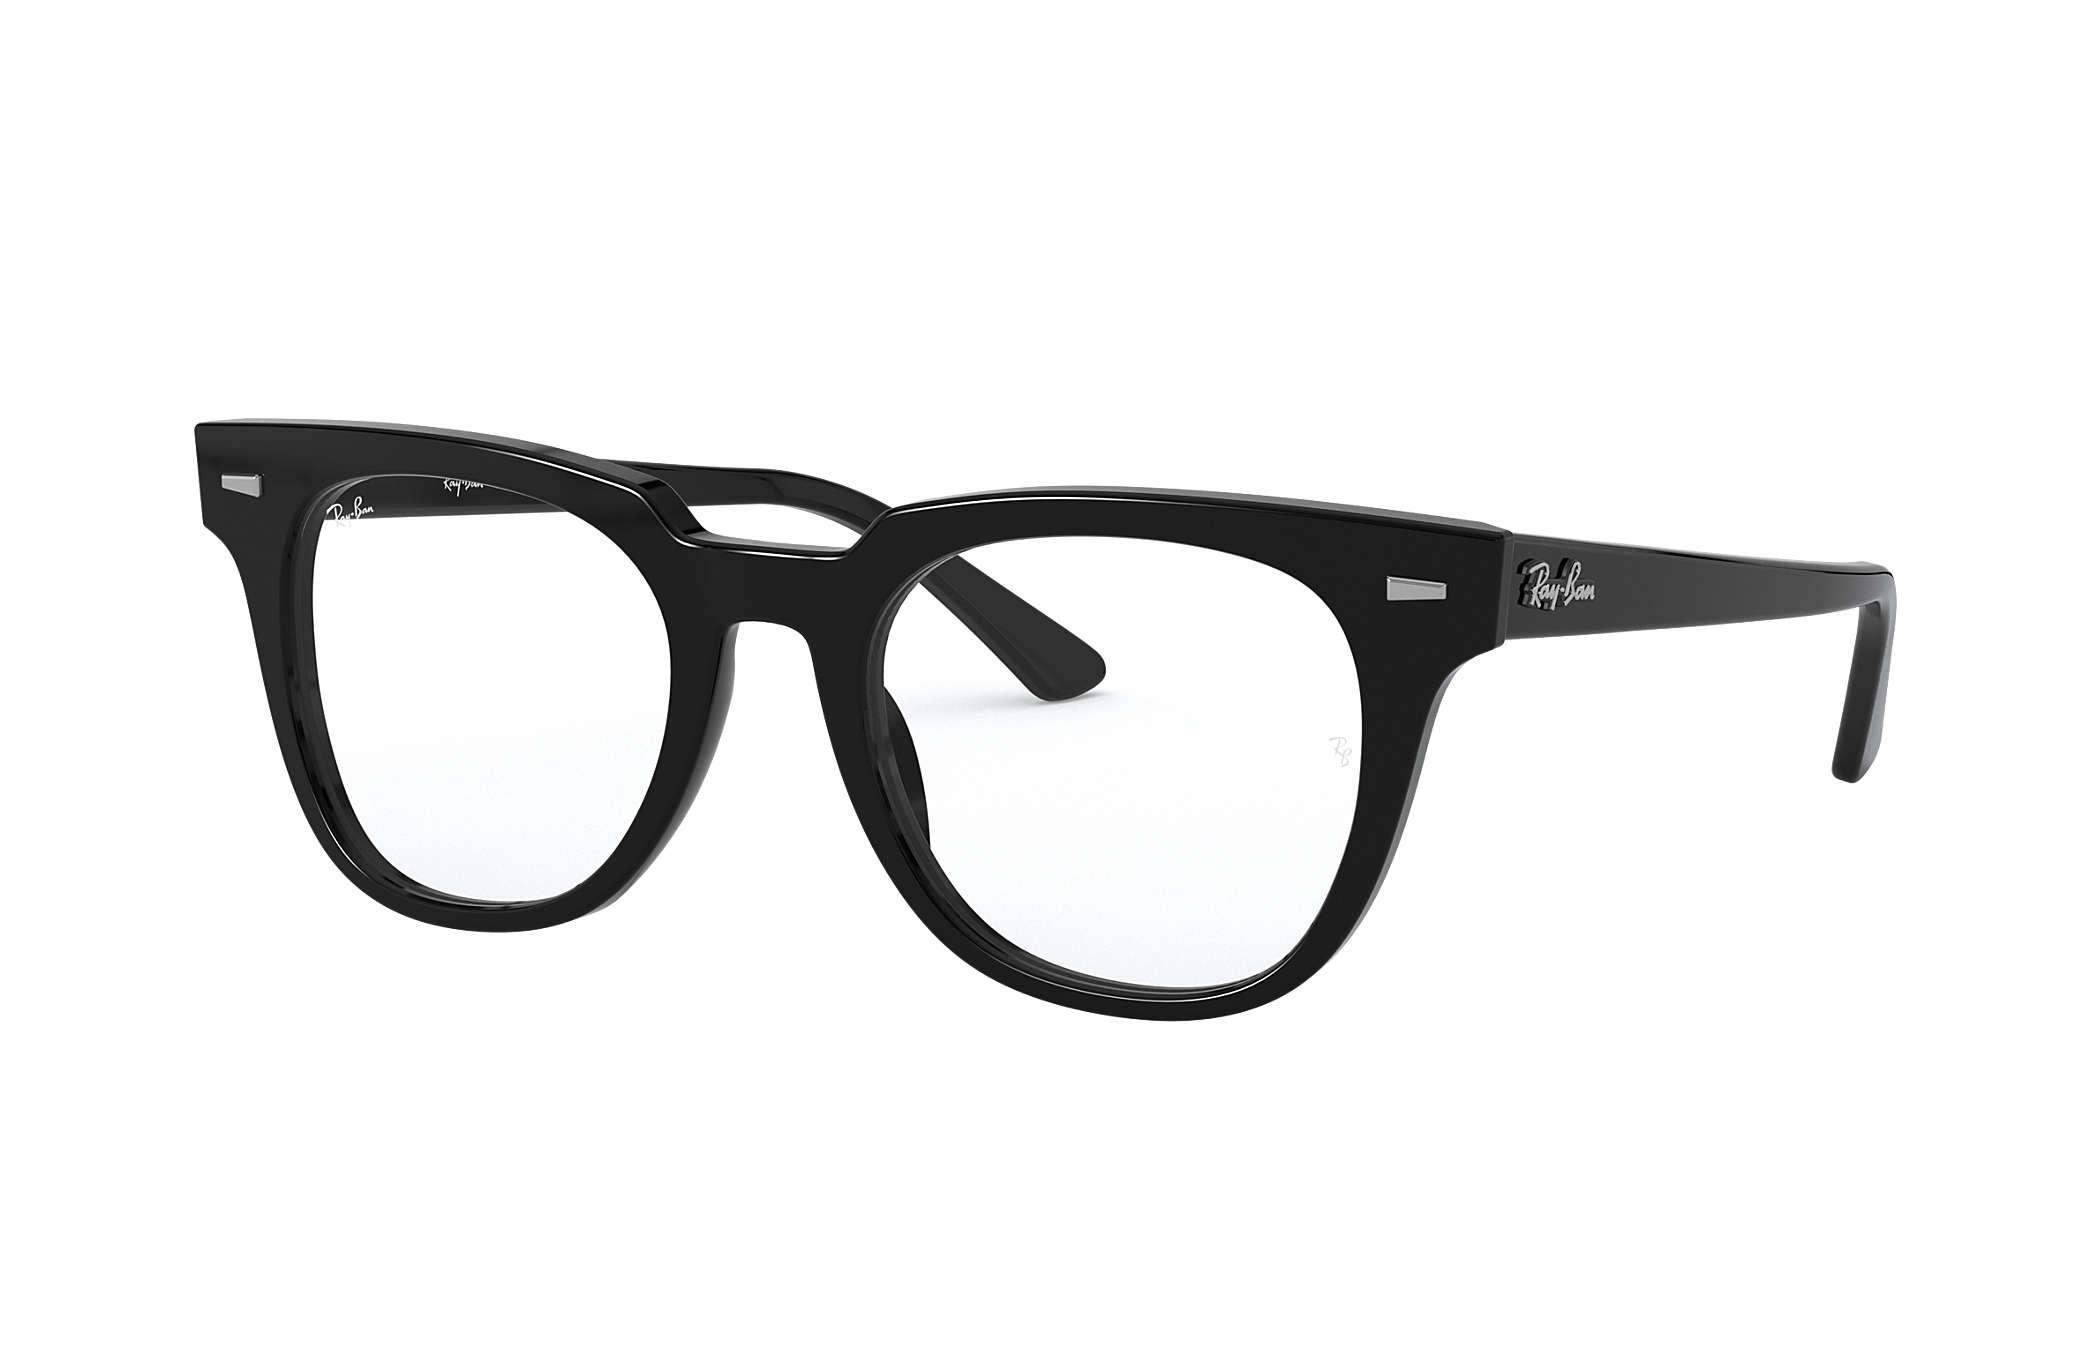 Ray Ban eyeglasses Meteor Optics RB5377 Black Acetate